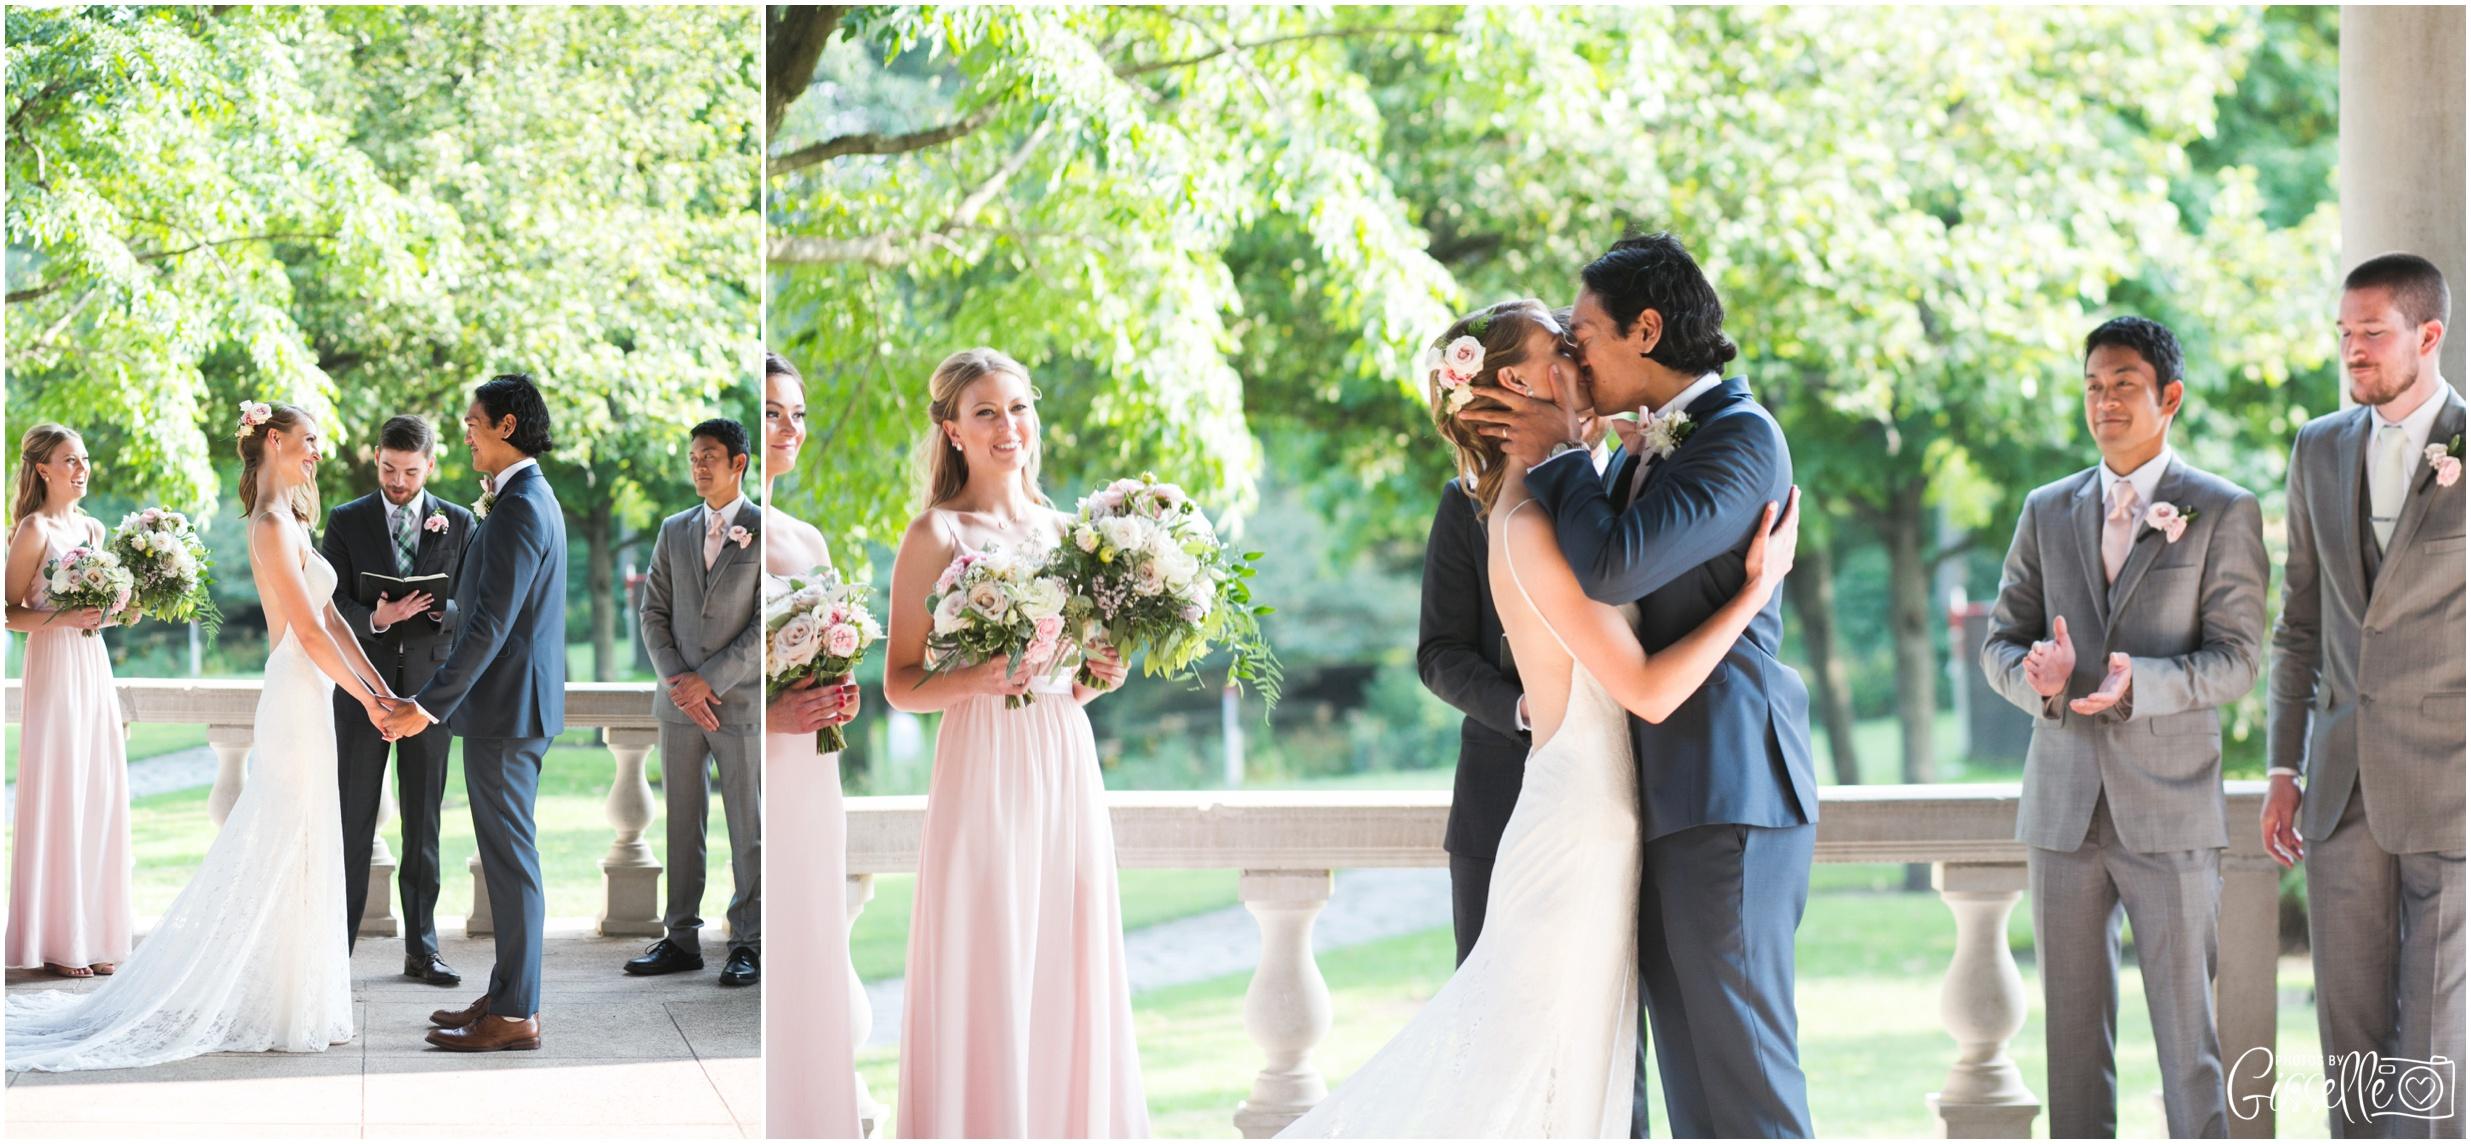 Columbus Park Refectory Wedding_0015.jpg